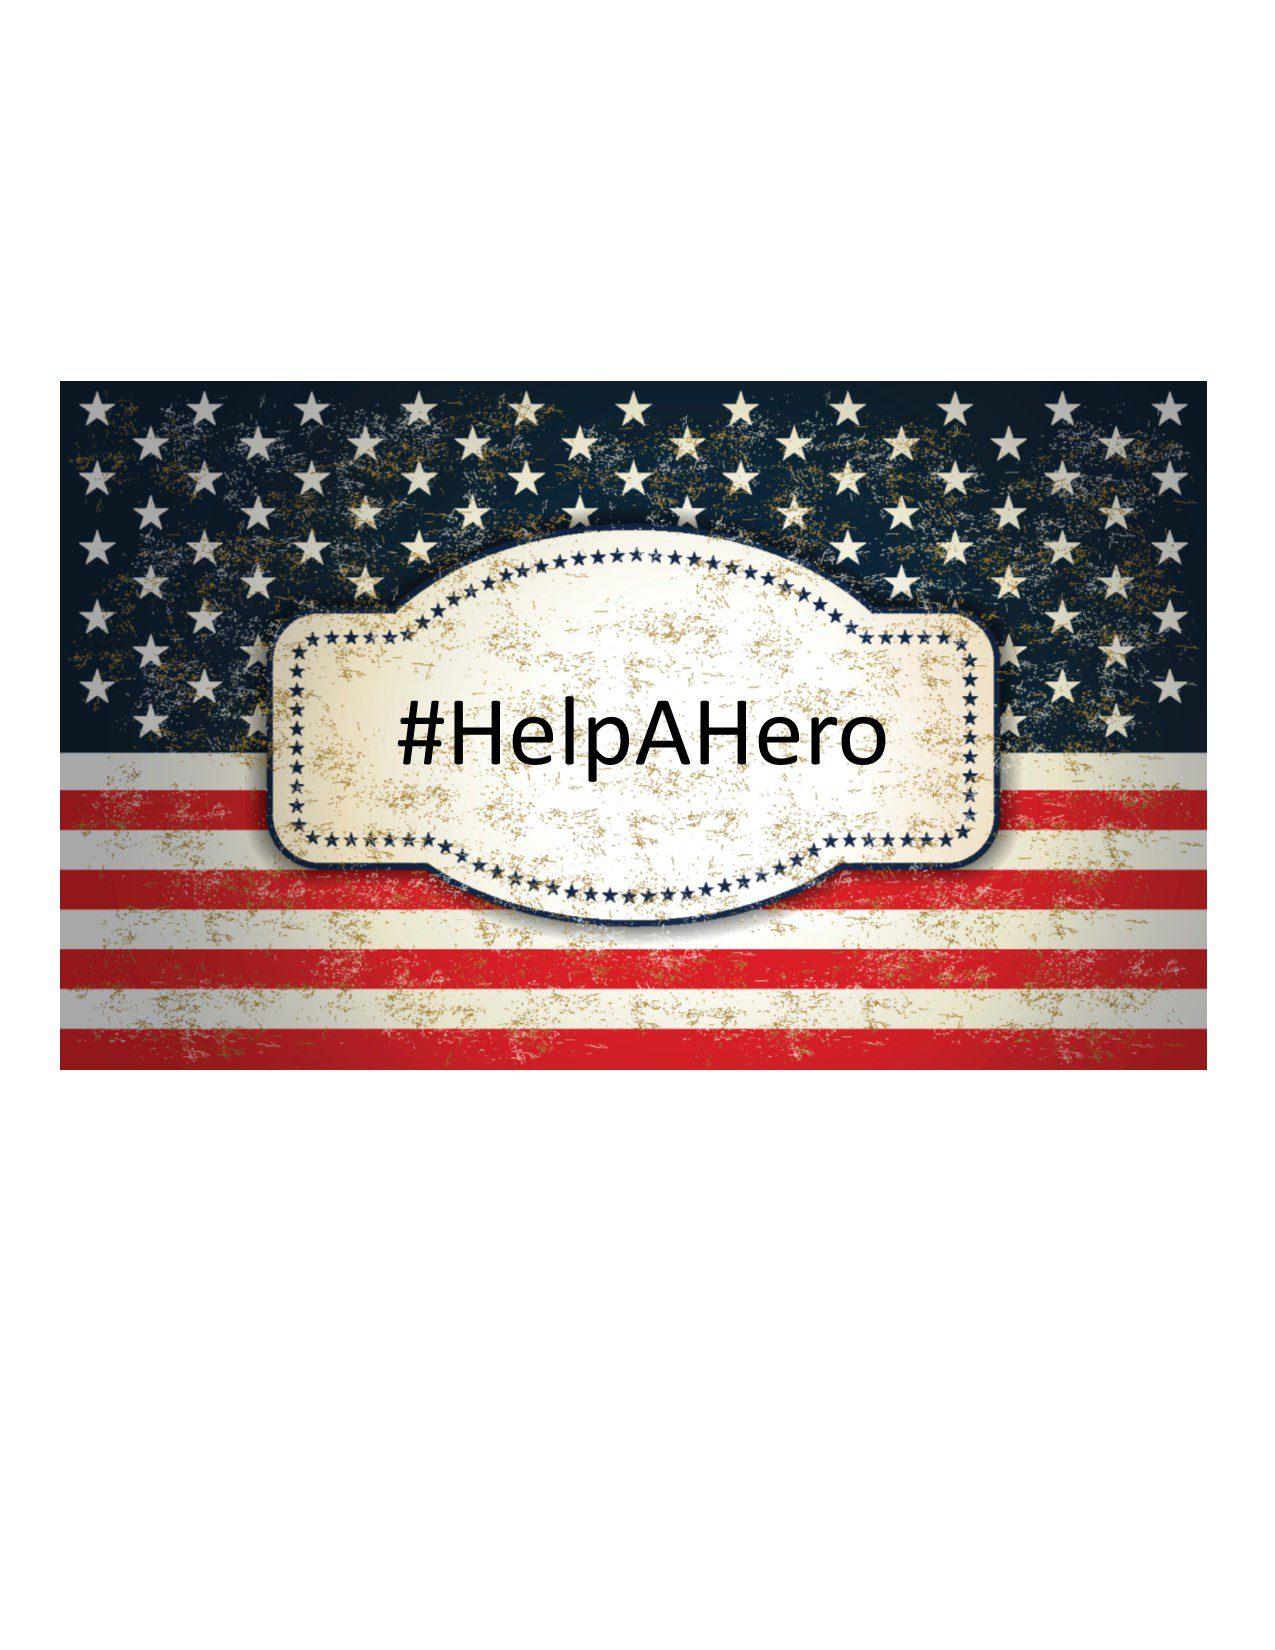 Help a hero banner